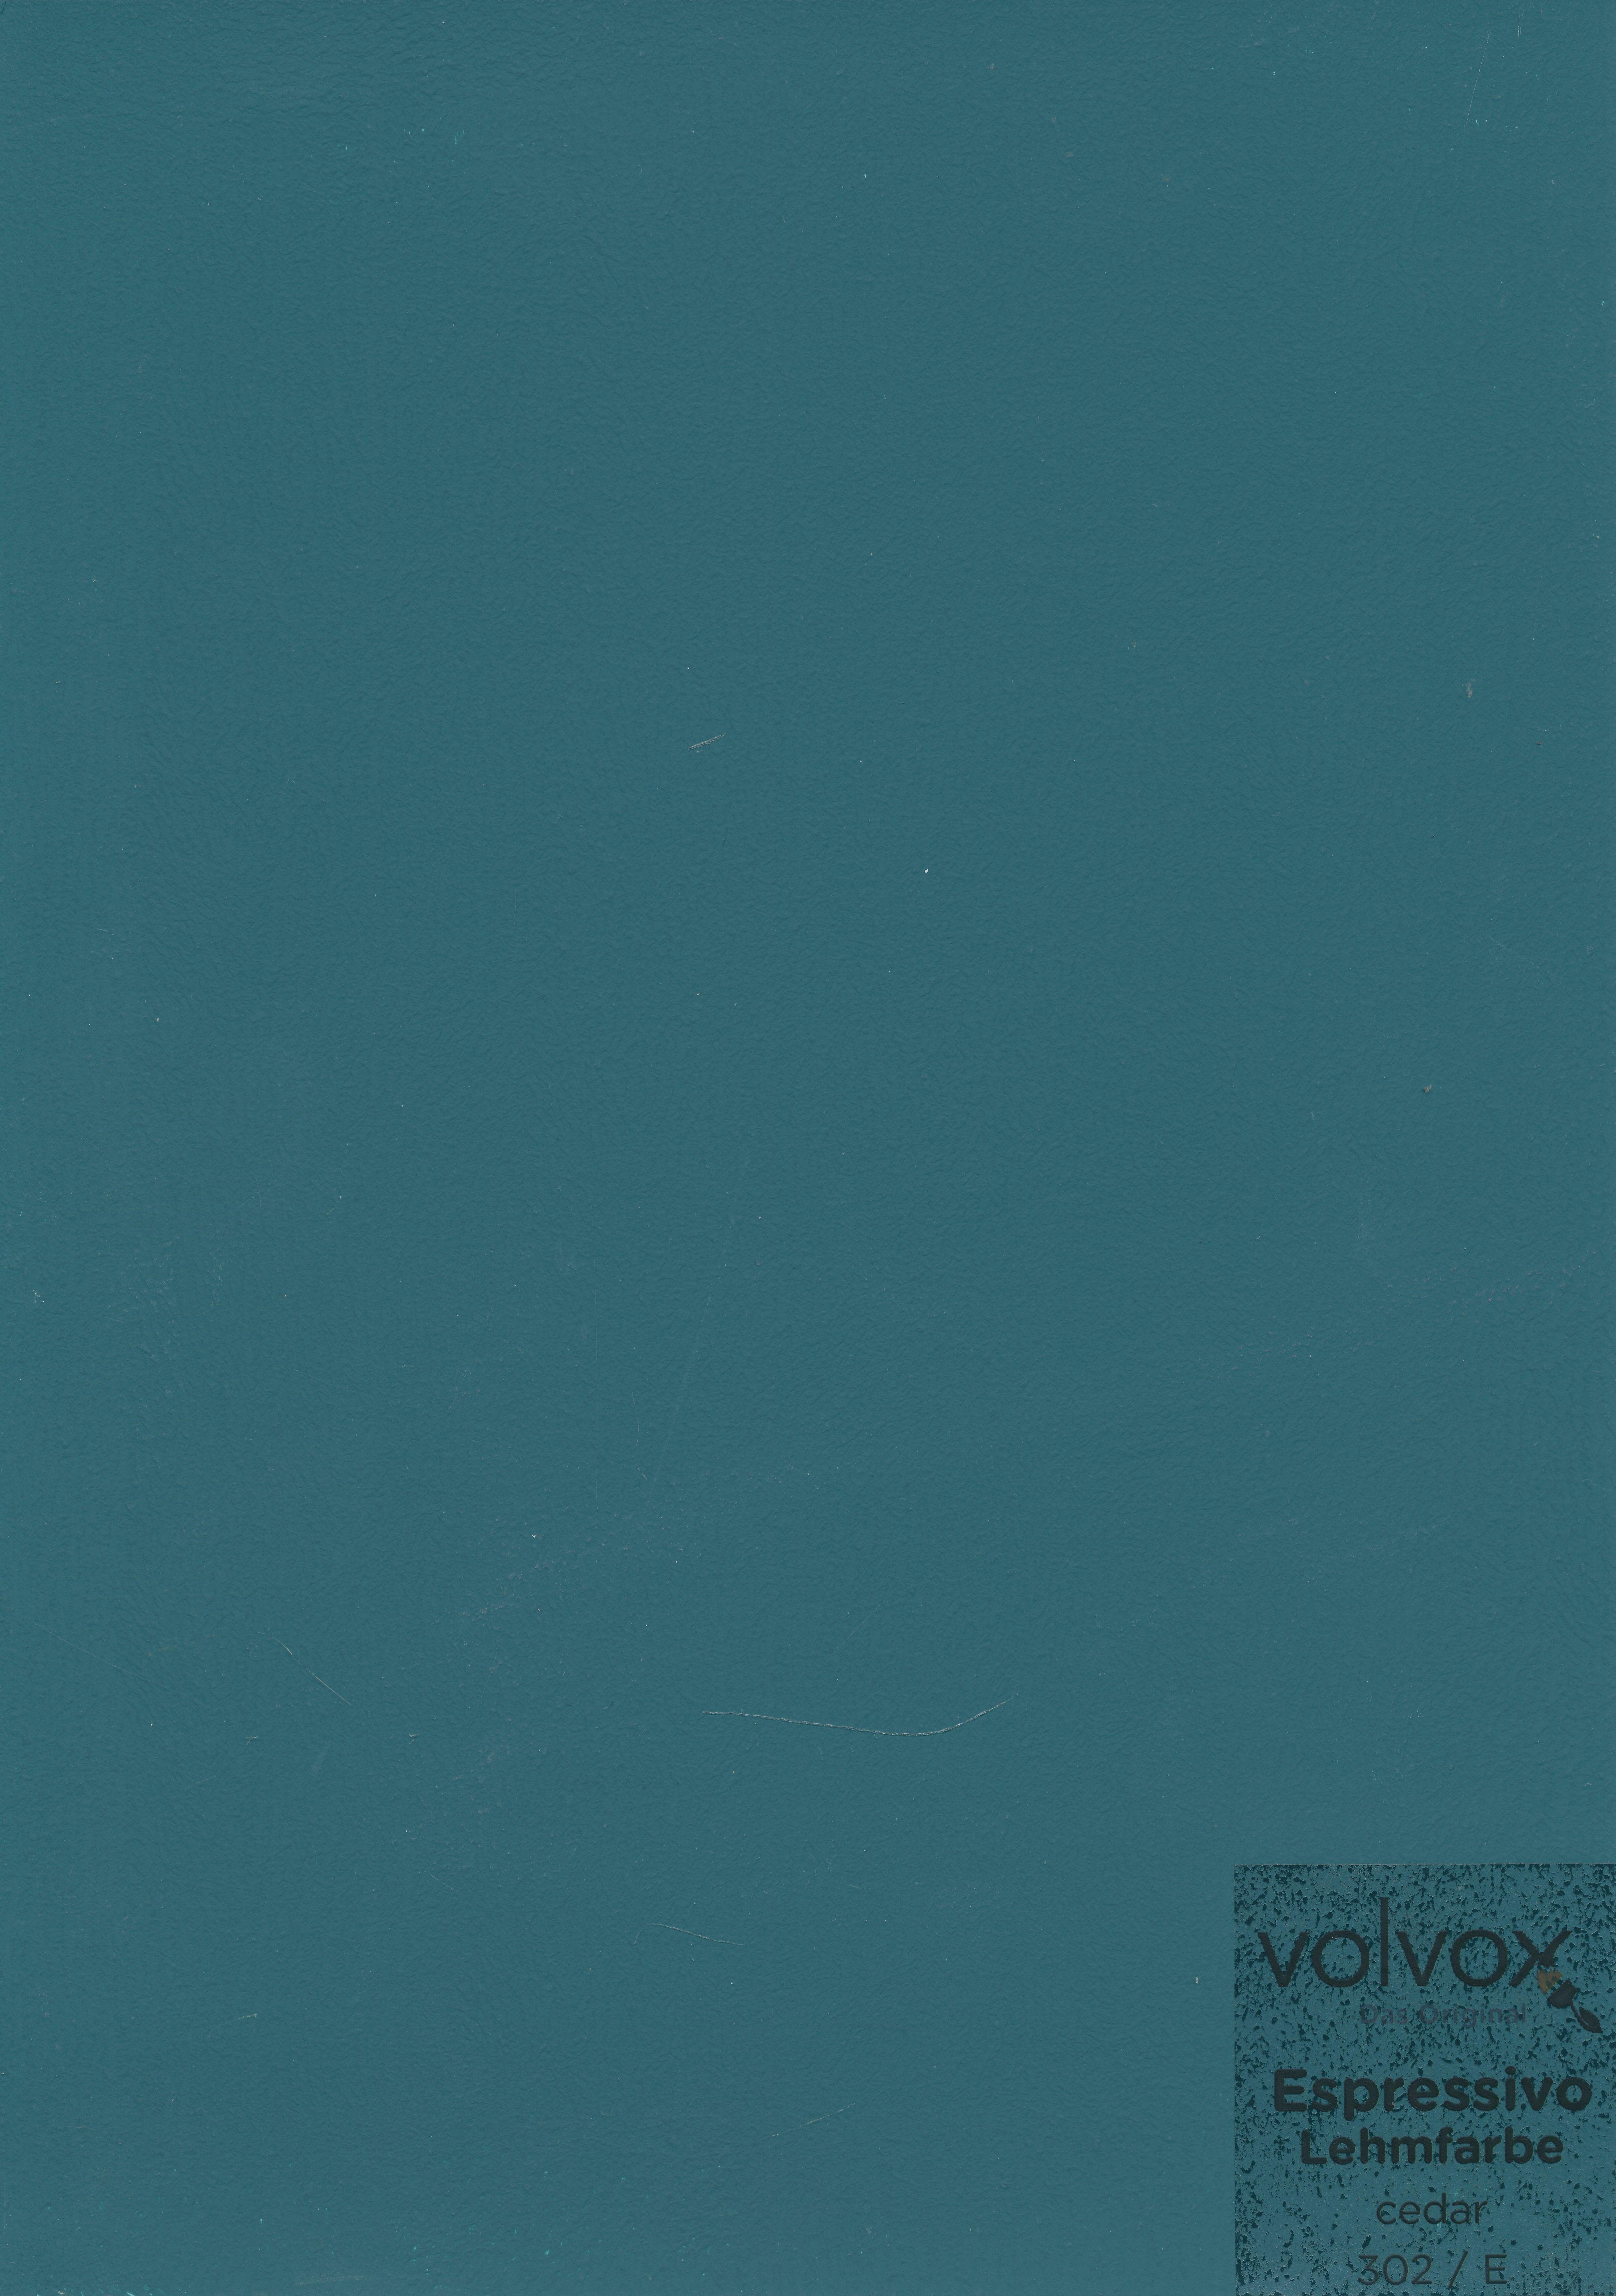 Volvox Espressivo Lehmfarbe 302 cedar